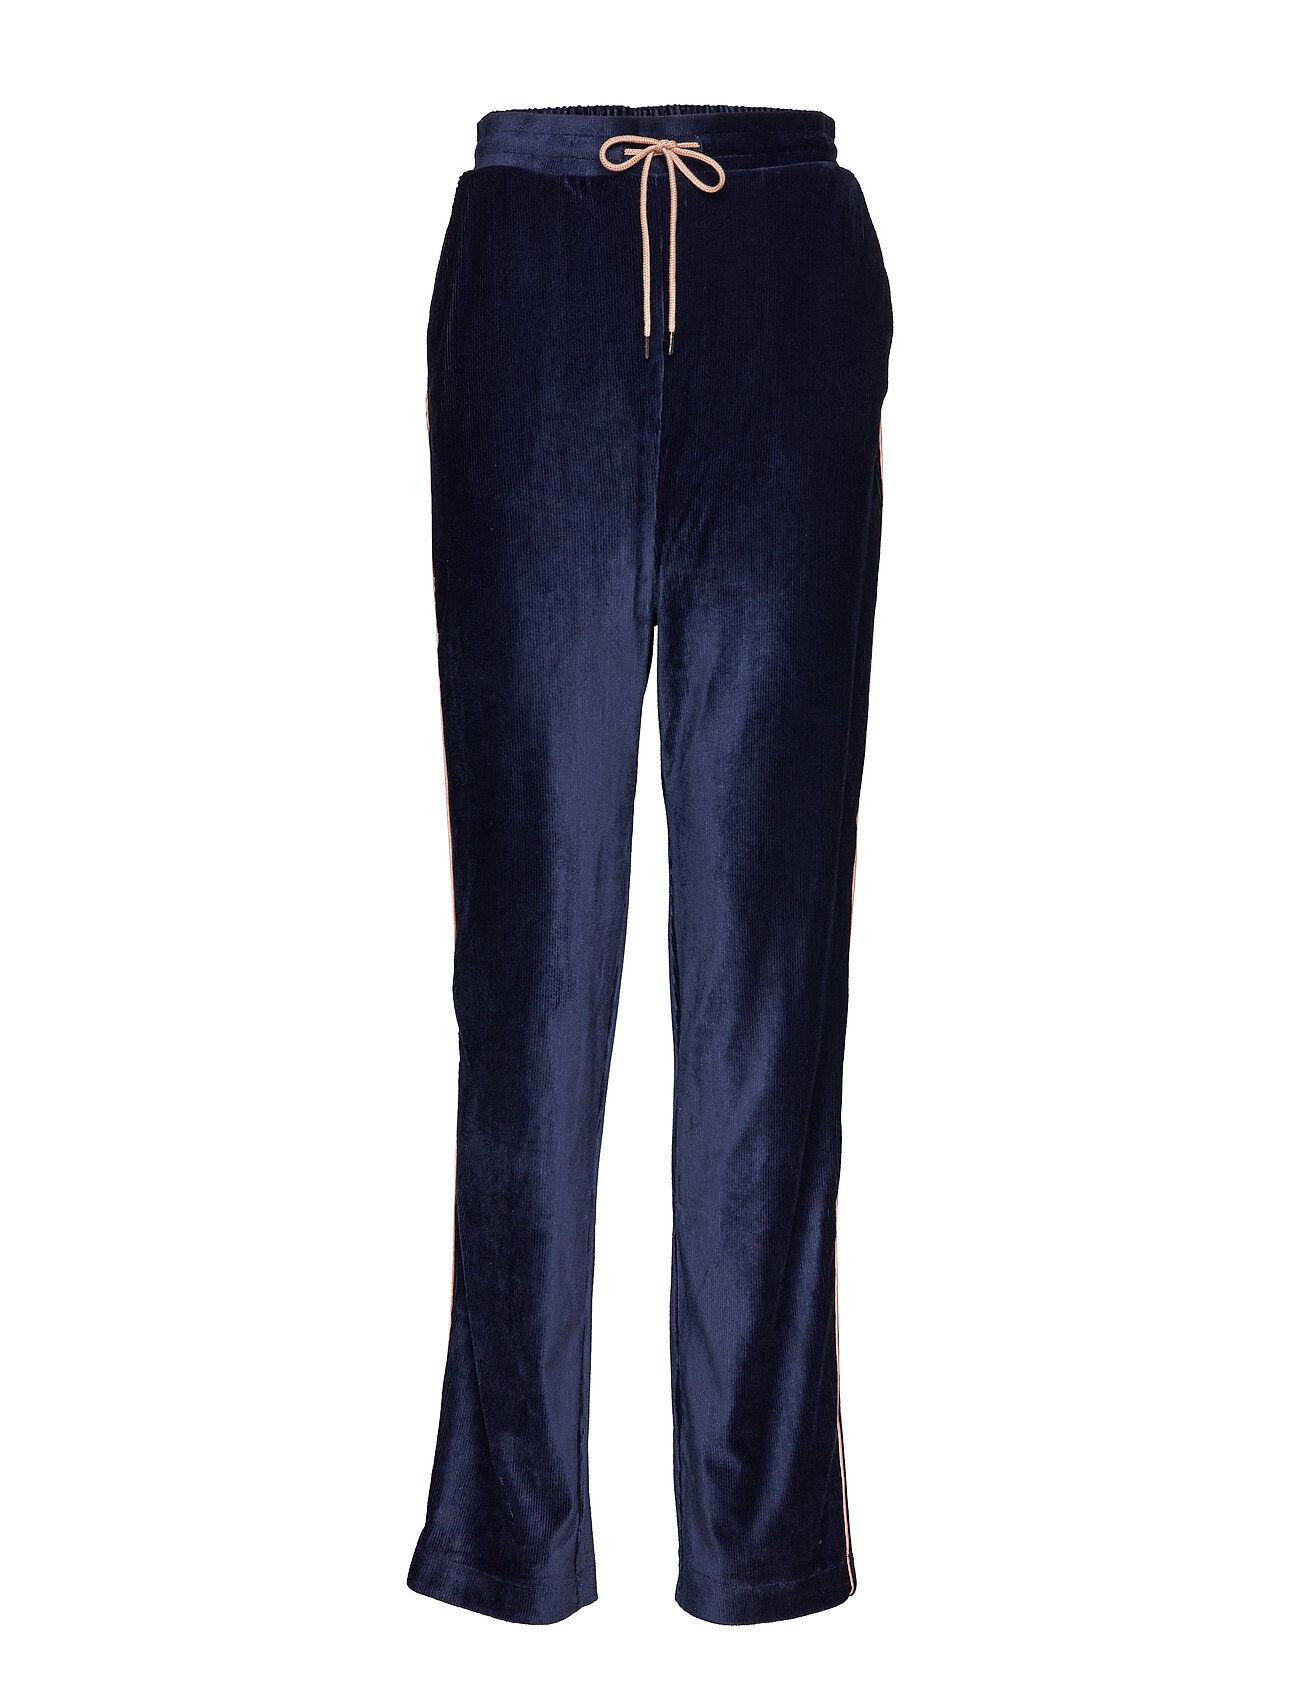 Soaked in Luxury Anella Velvet Pants Casual Housut Sininen Soaked In Luxury